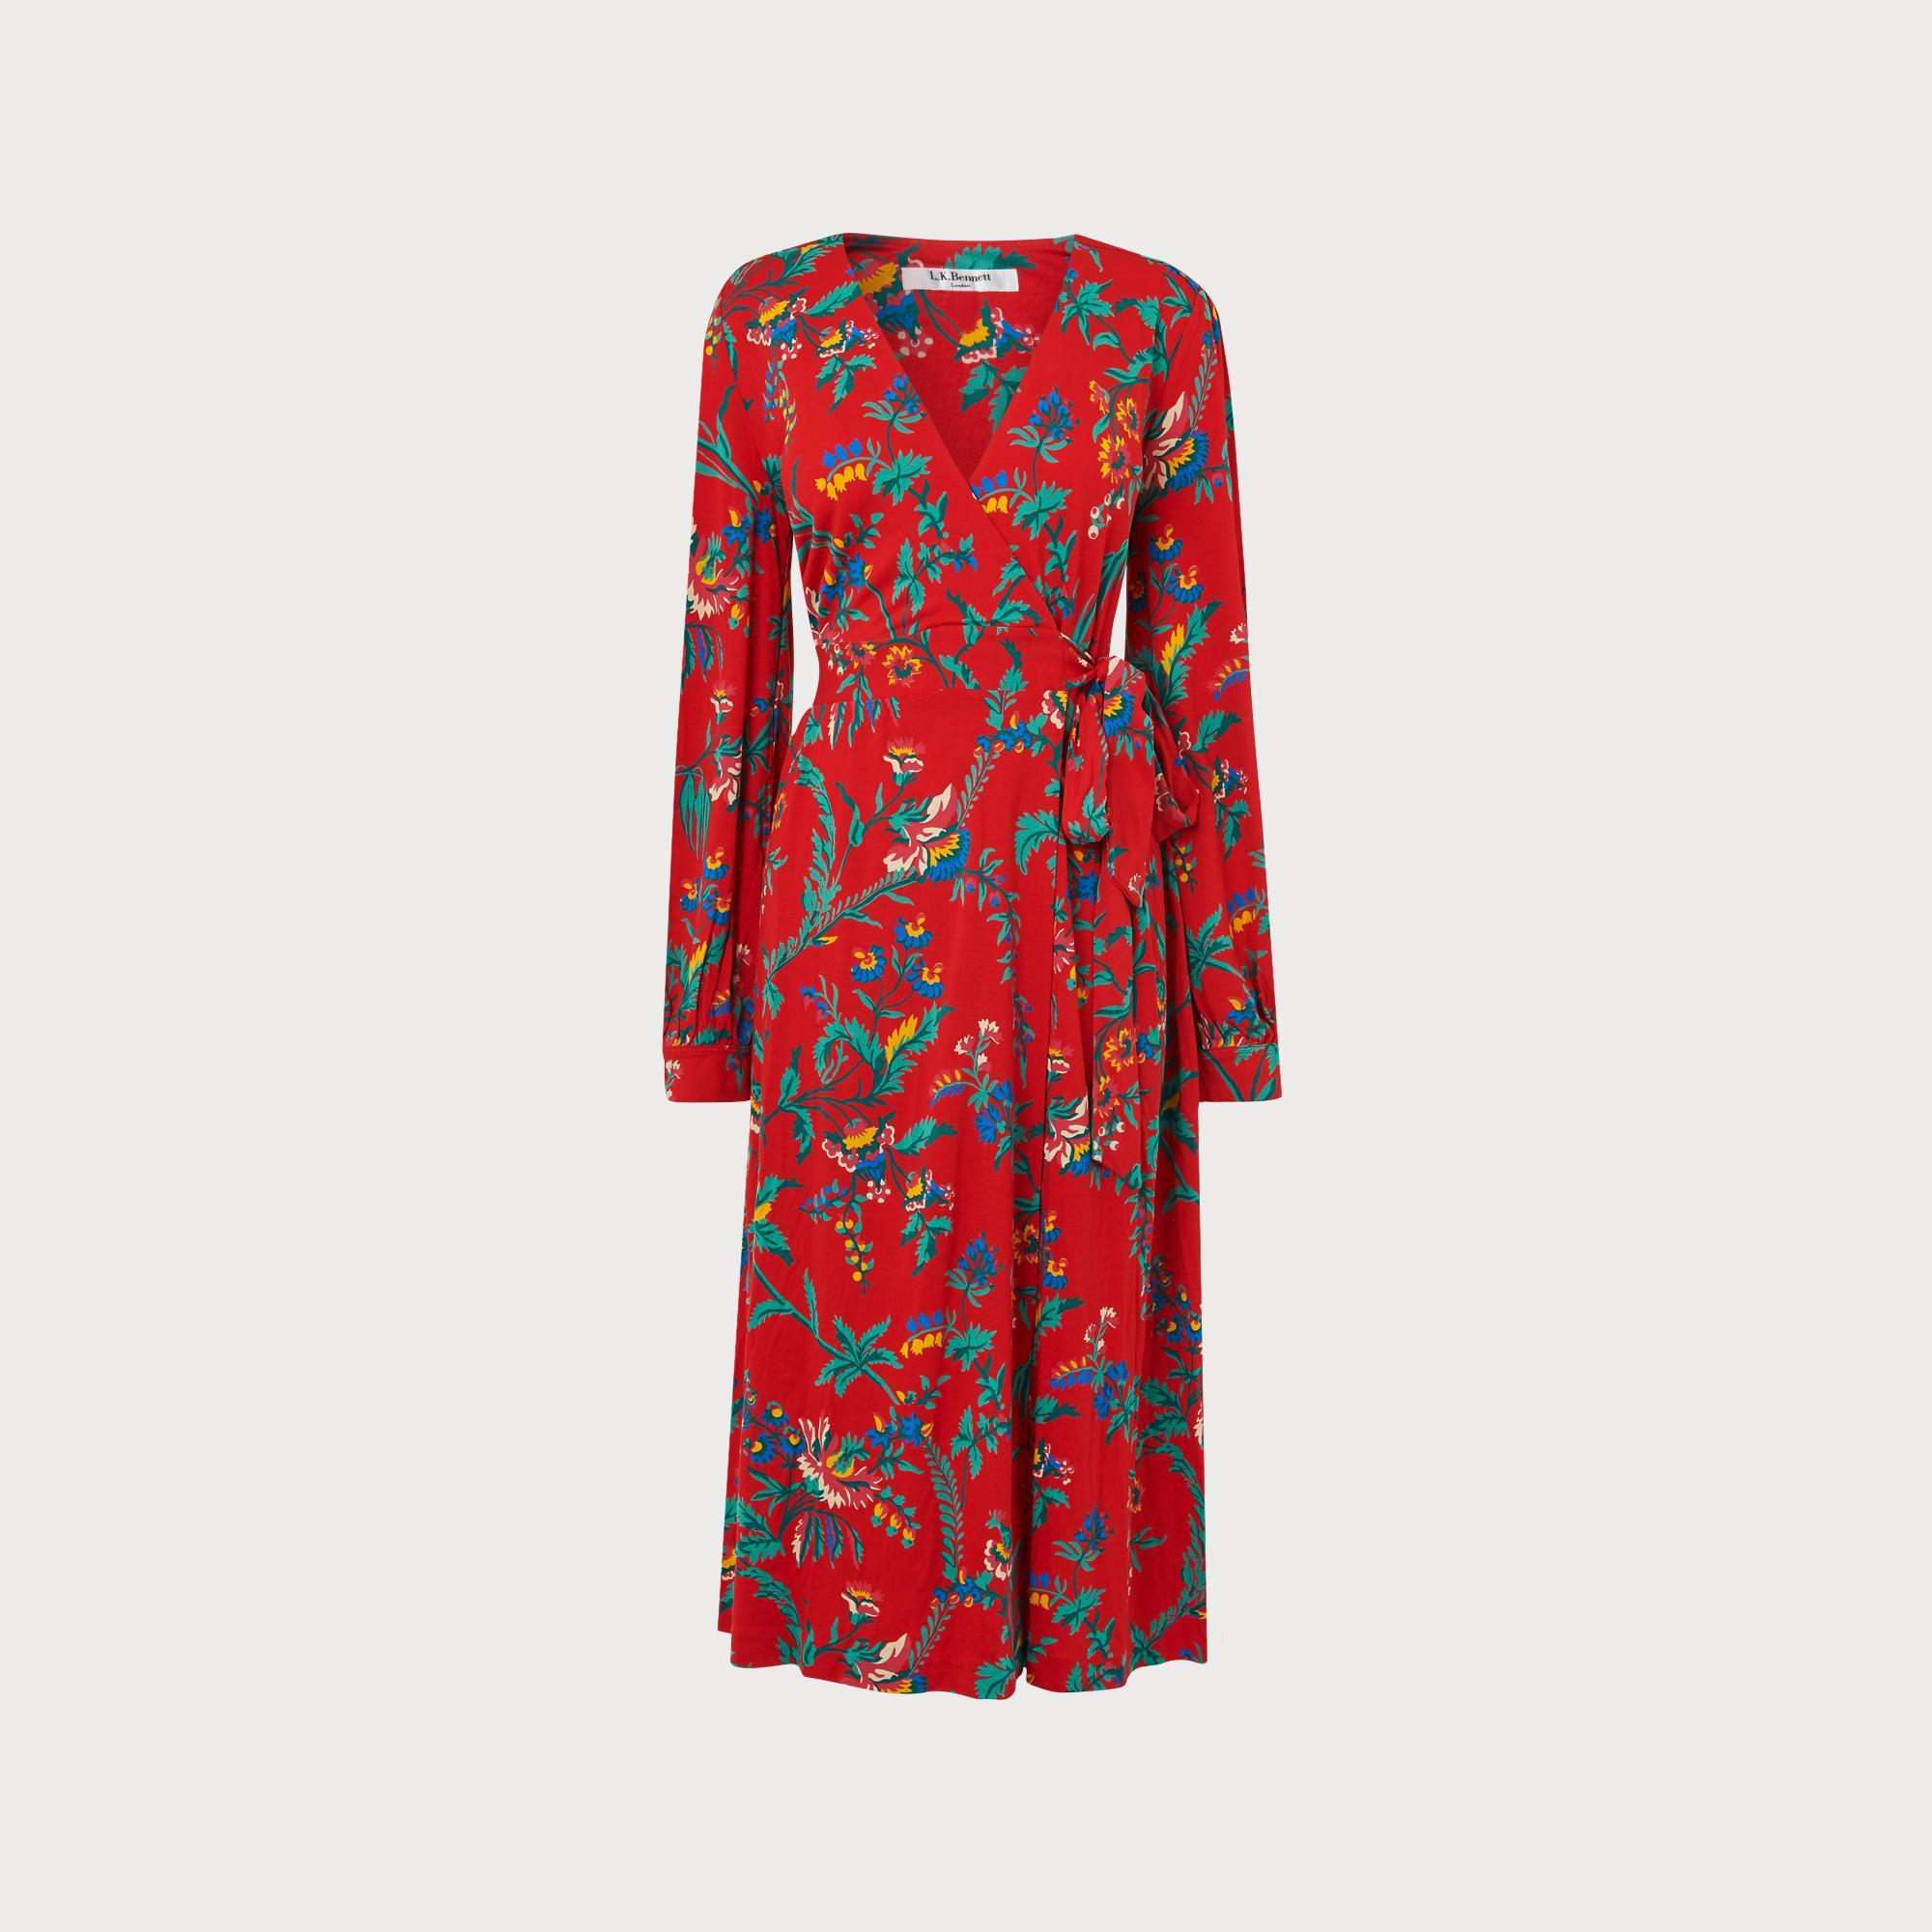 0f261bdd5 Ella Red Wildflower Print Wrap Dress   Clothing   L.K.Bennett